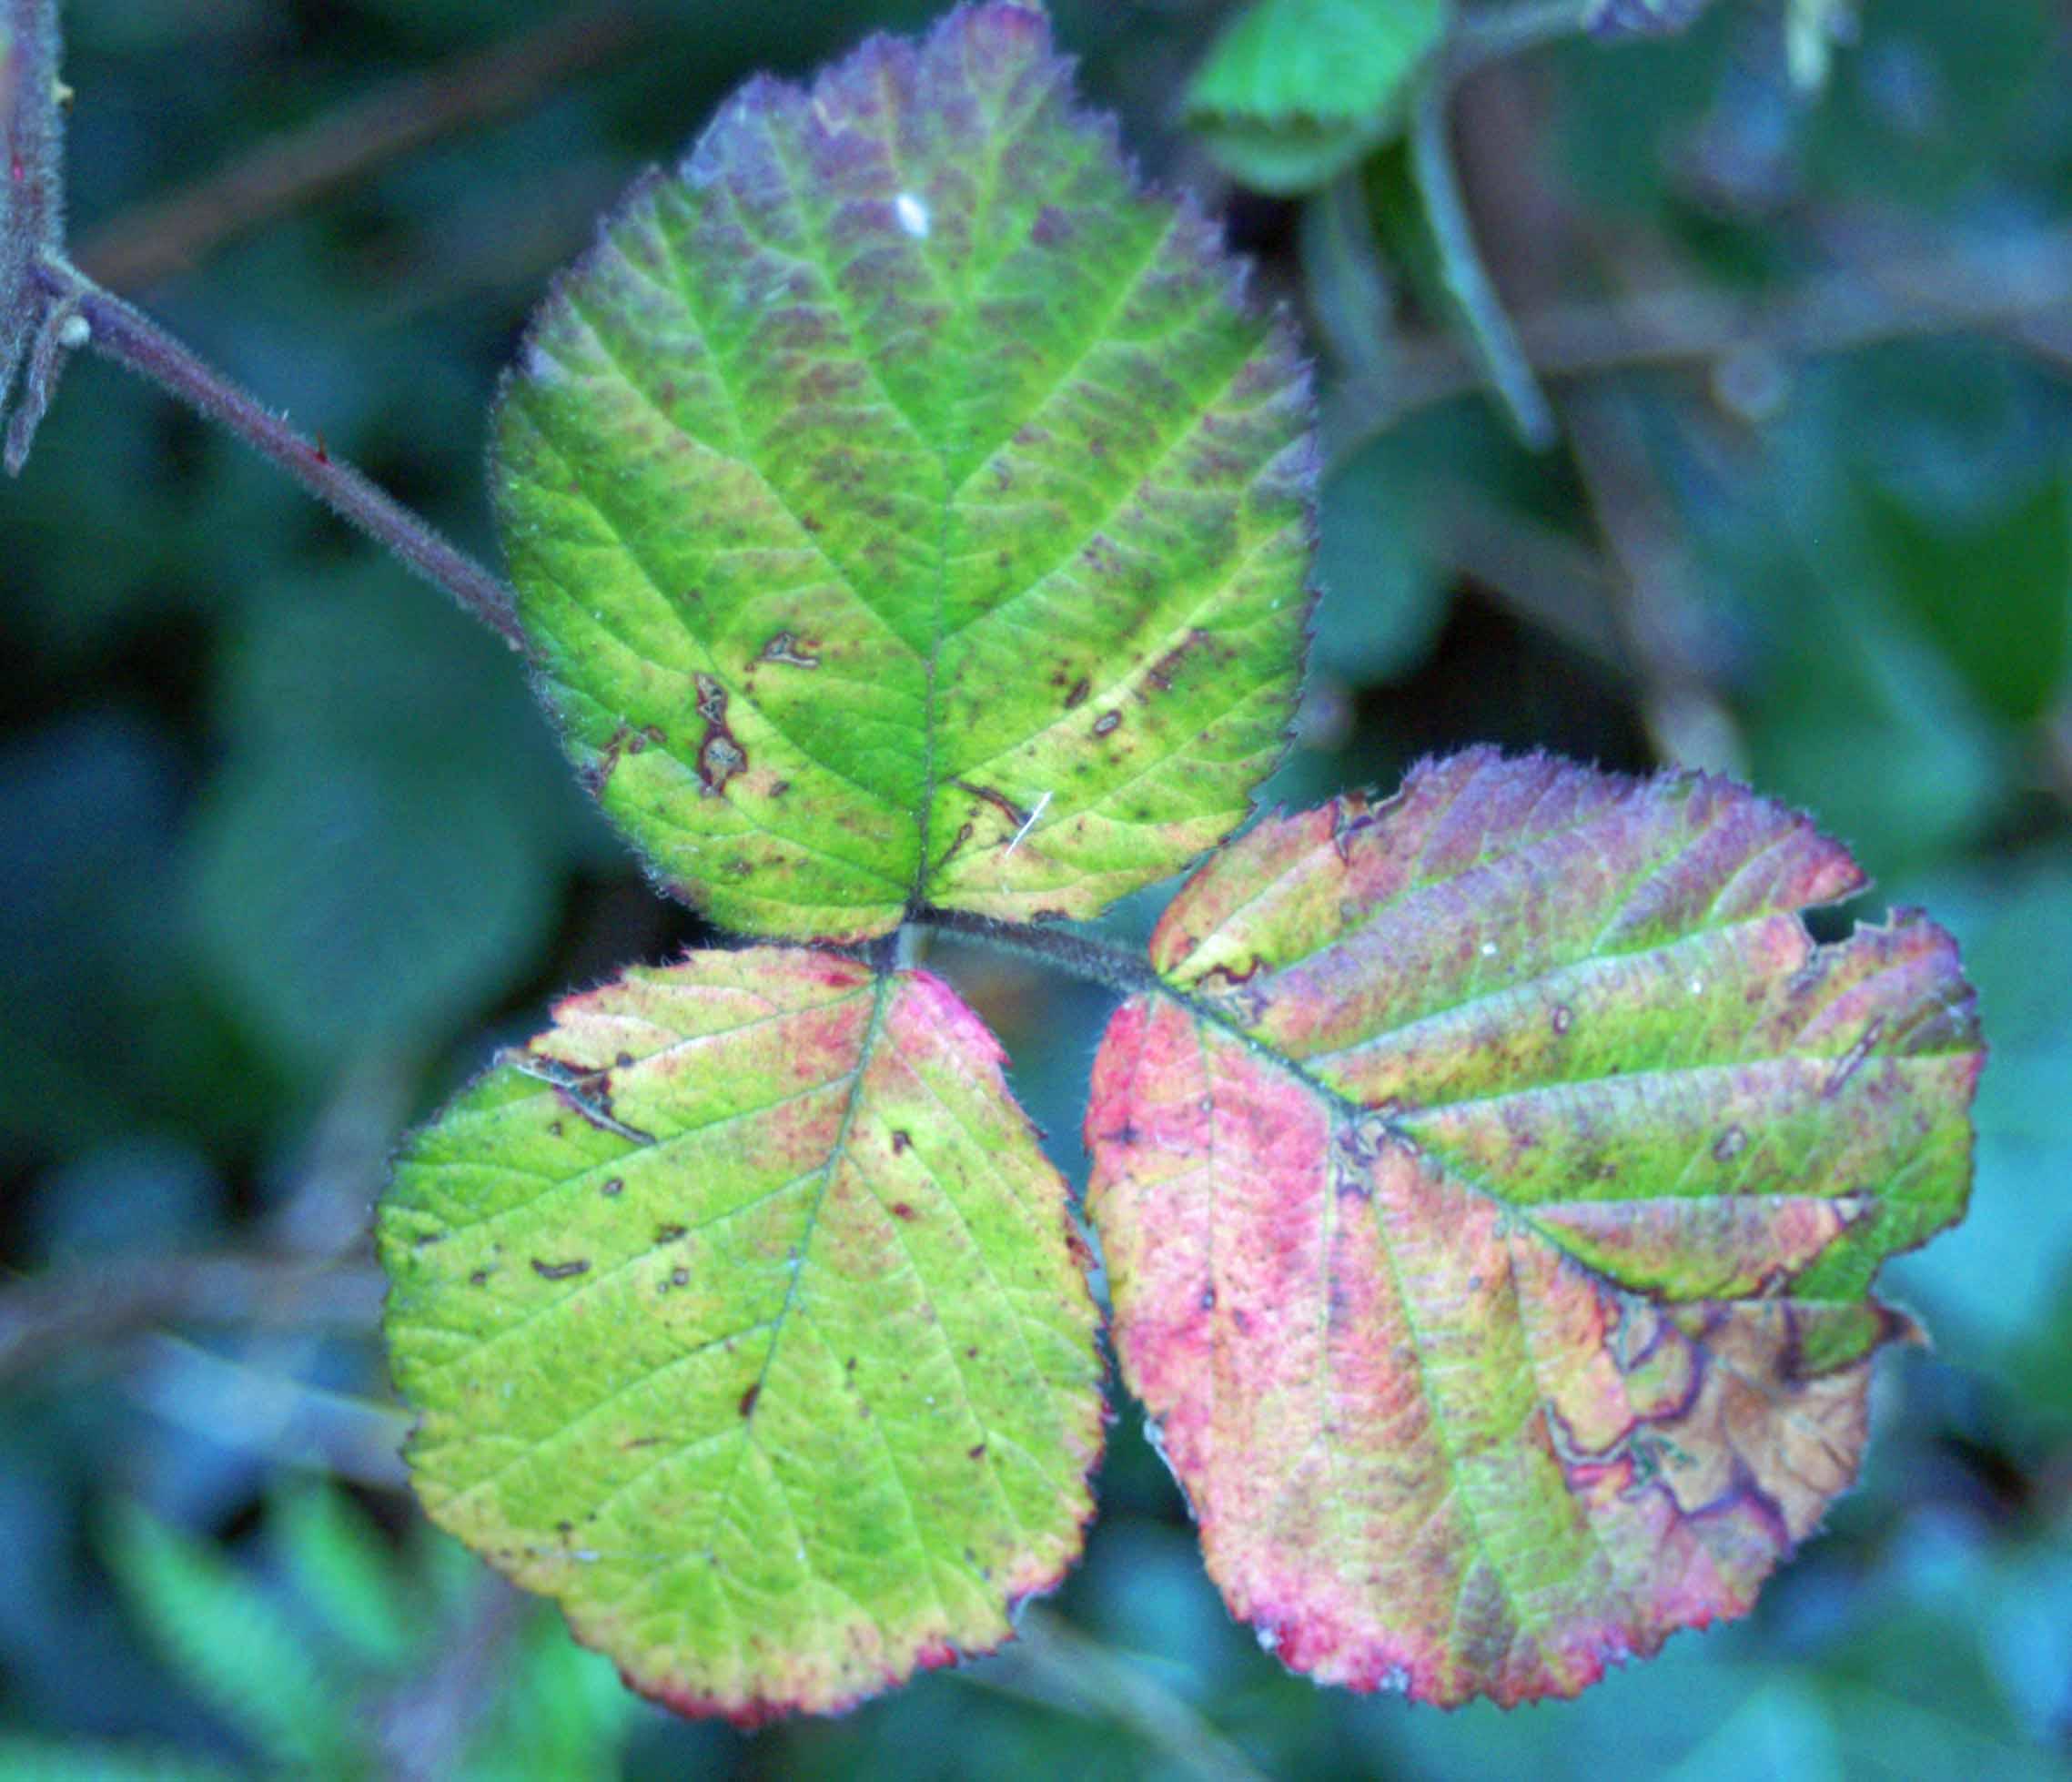 blackberry bramble | everyday nature trails